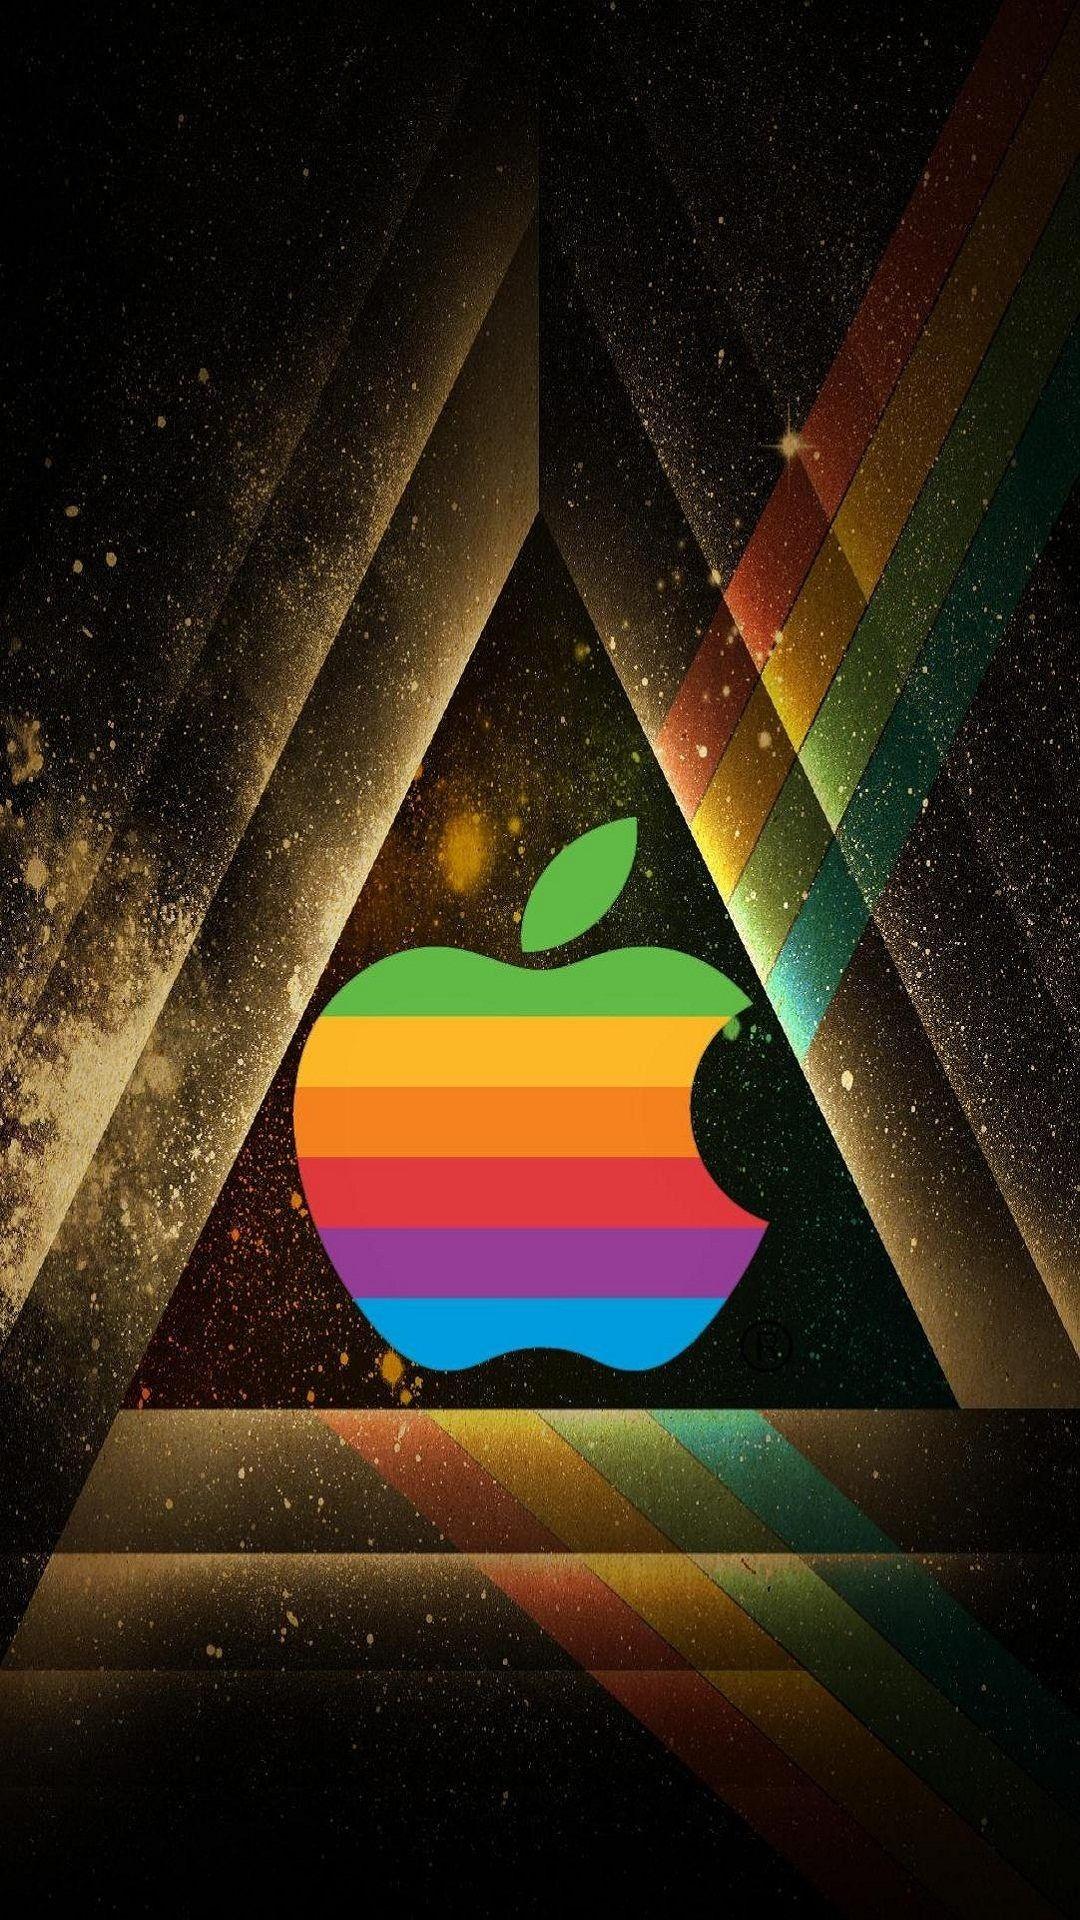 Wallpaper iphone apple logo - Logos Apple Logo Iphone 6 Plus Wallpapers Abstract Amazing Iphone 6 Plus Wallpapers